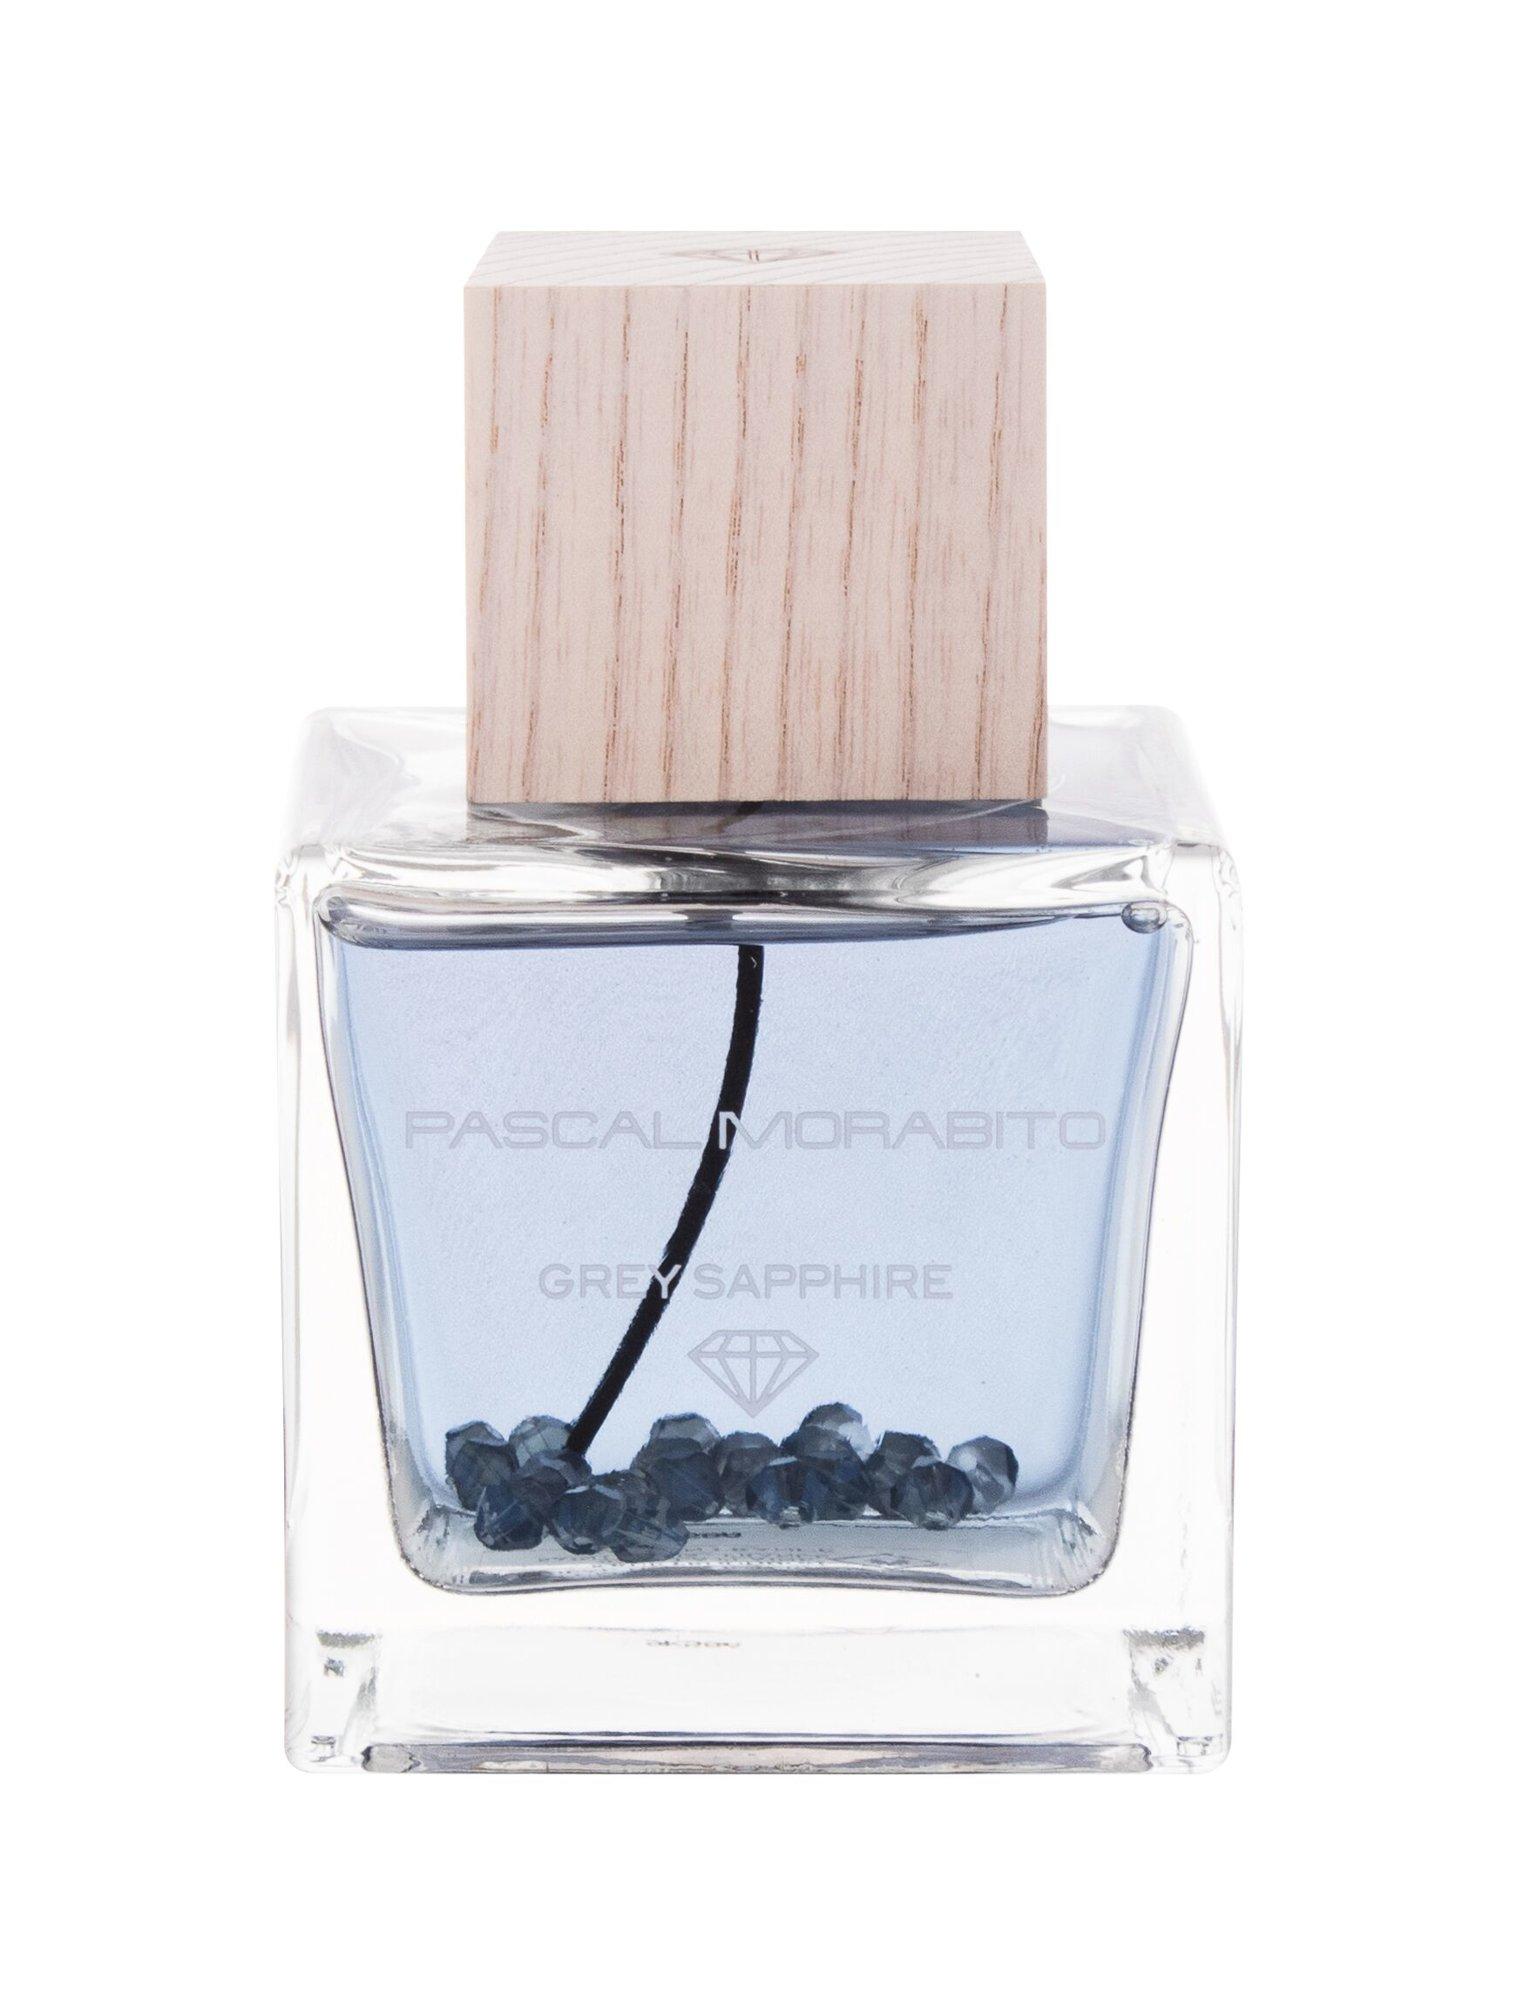 Pascal Morabito Grey Sapphire